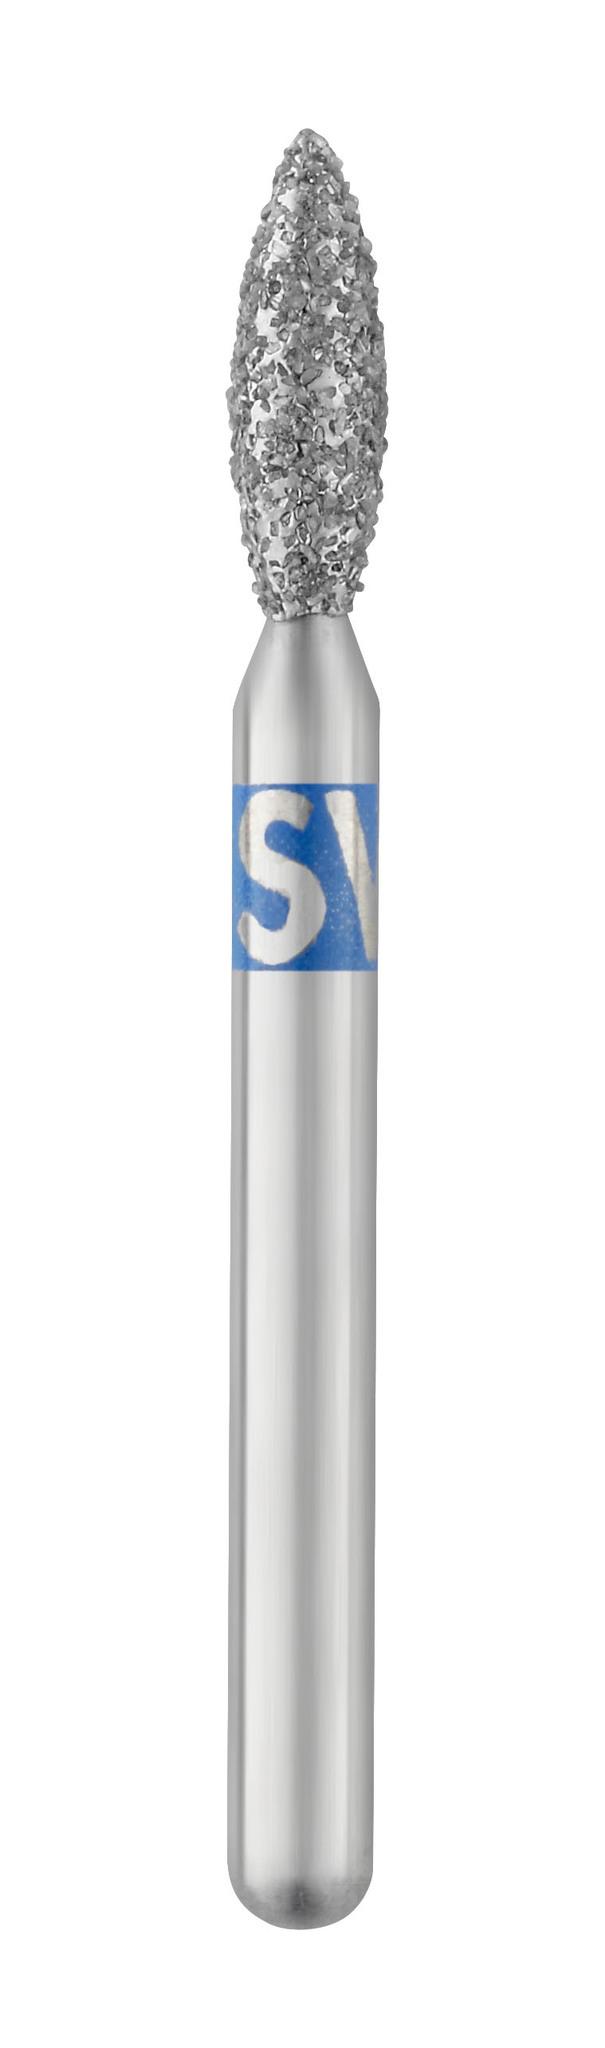 Алмазные боры Супер Финиры «SS WHITE» серия RA CS 868/018